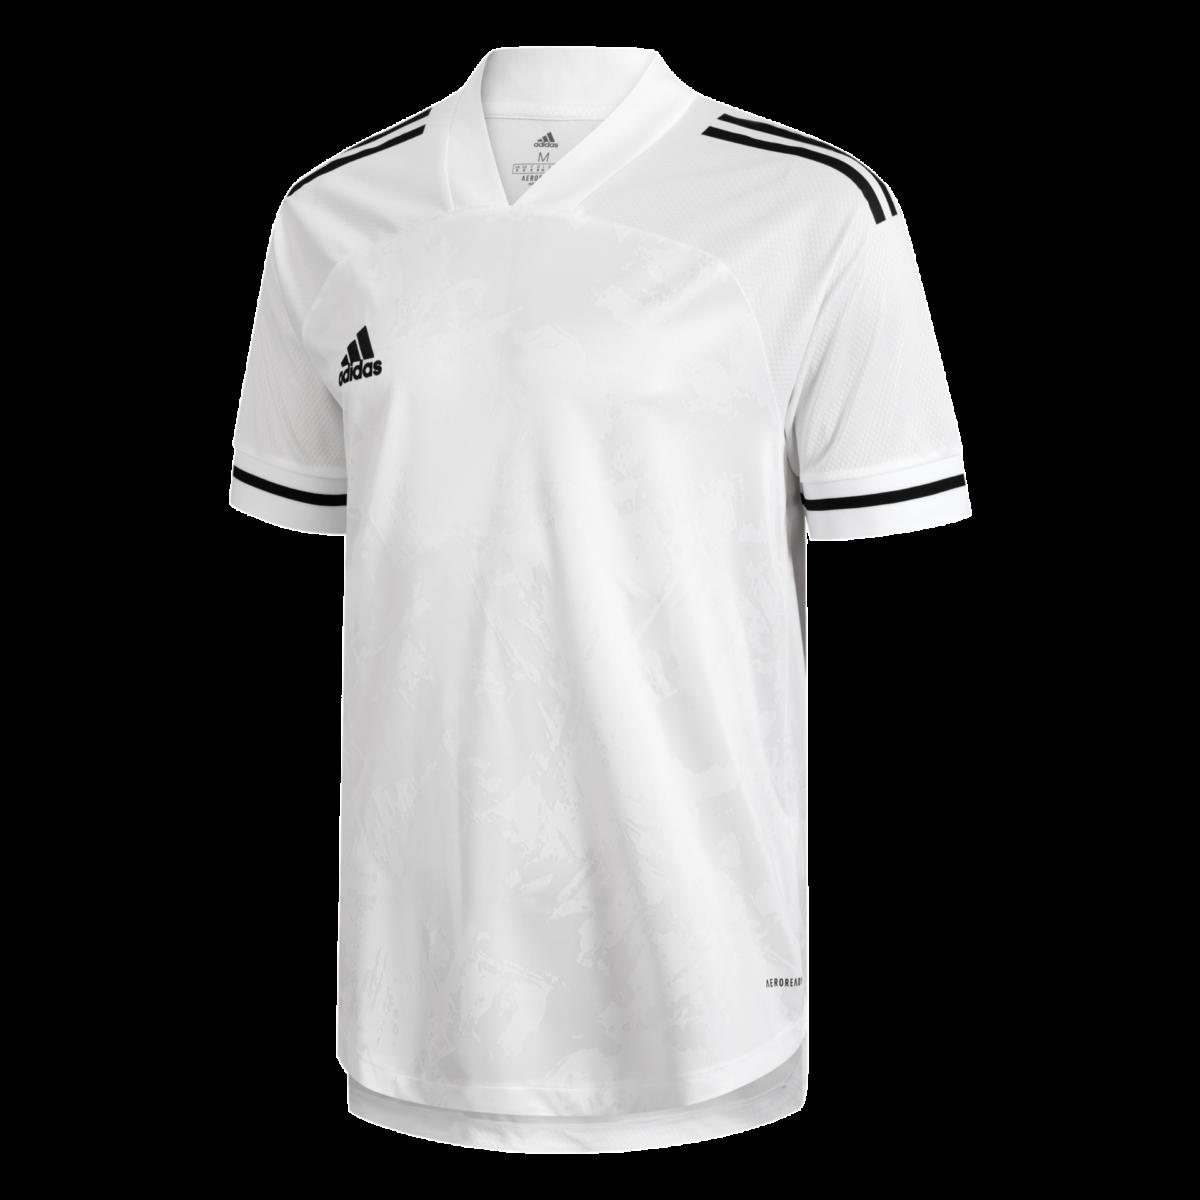 Adidas Condivo 20 Football Shirt - ADULT NEW for 2020